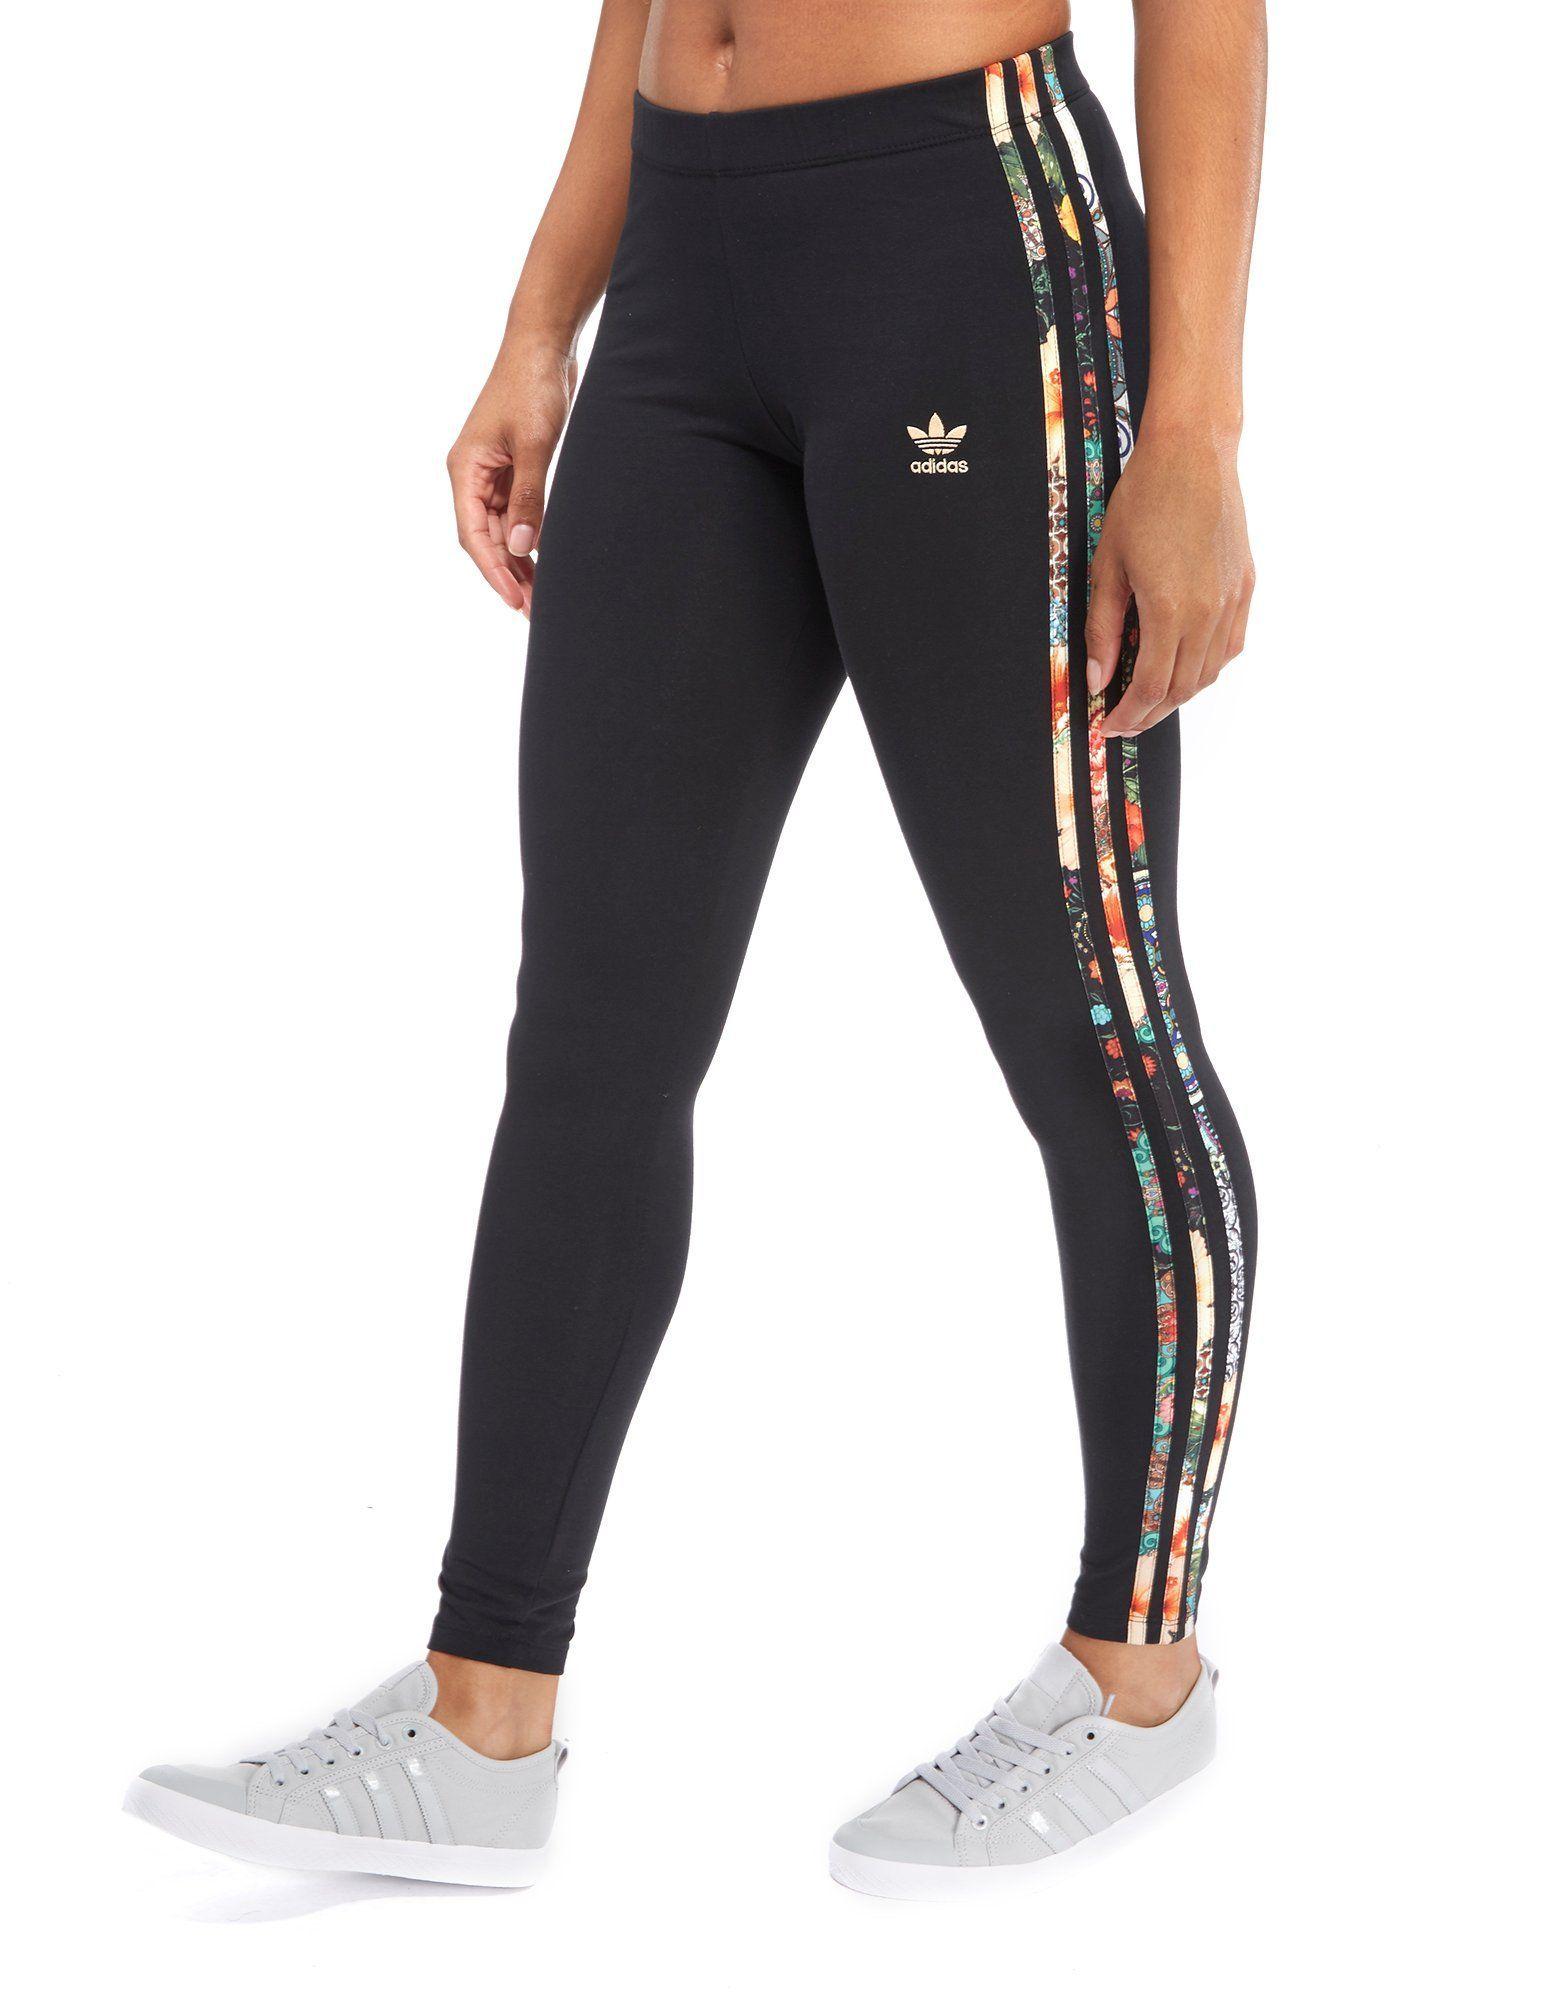 adidas Originals 3 Stripes Leggings Farm Pack Shop online